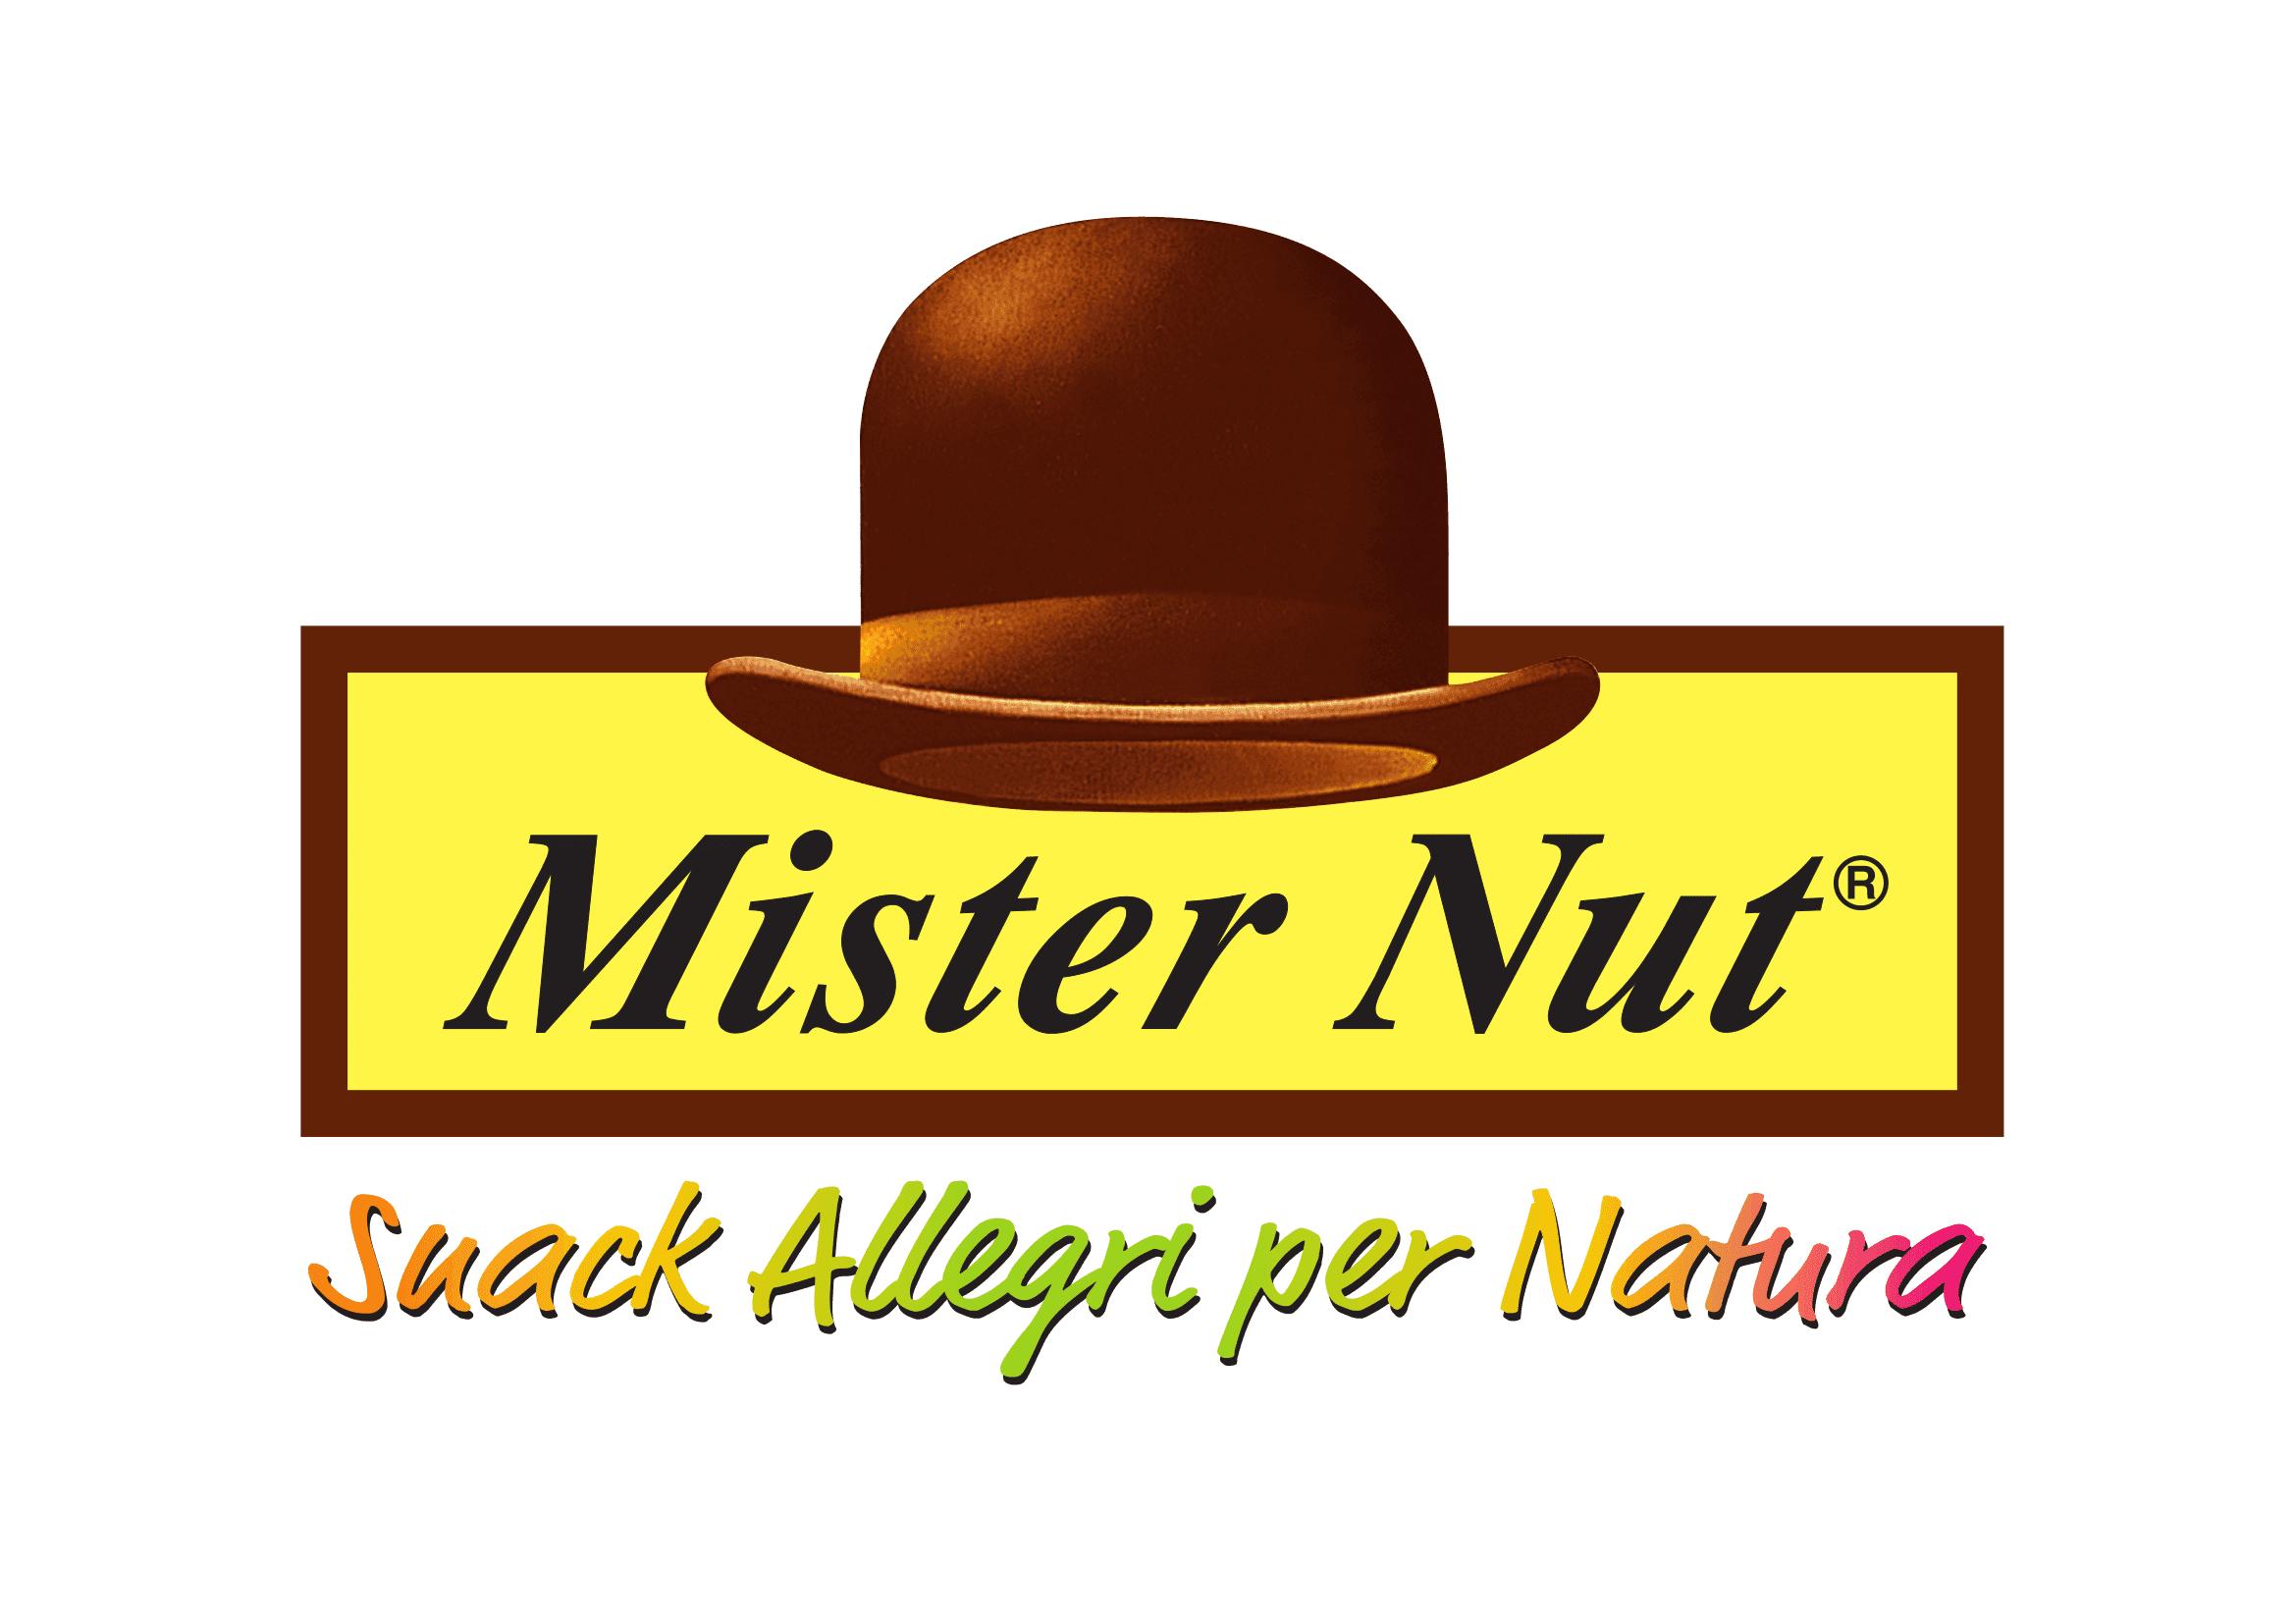 Marchio Mister Nut - logo